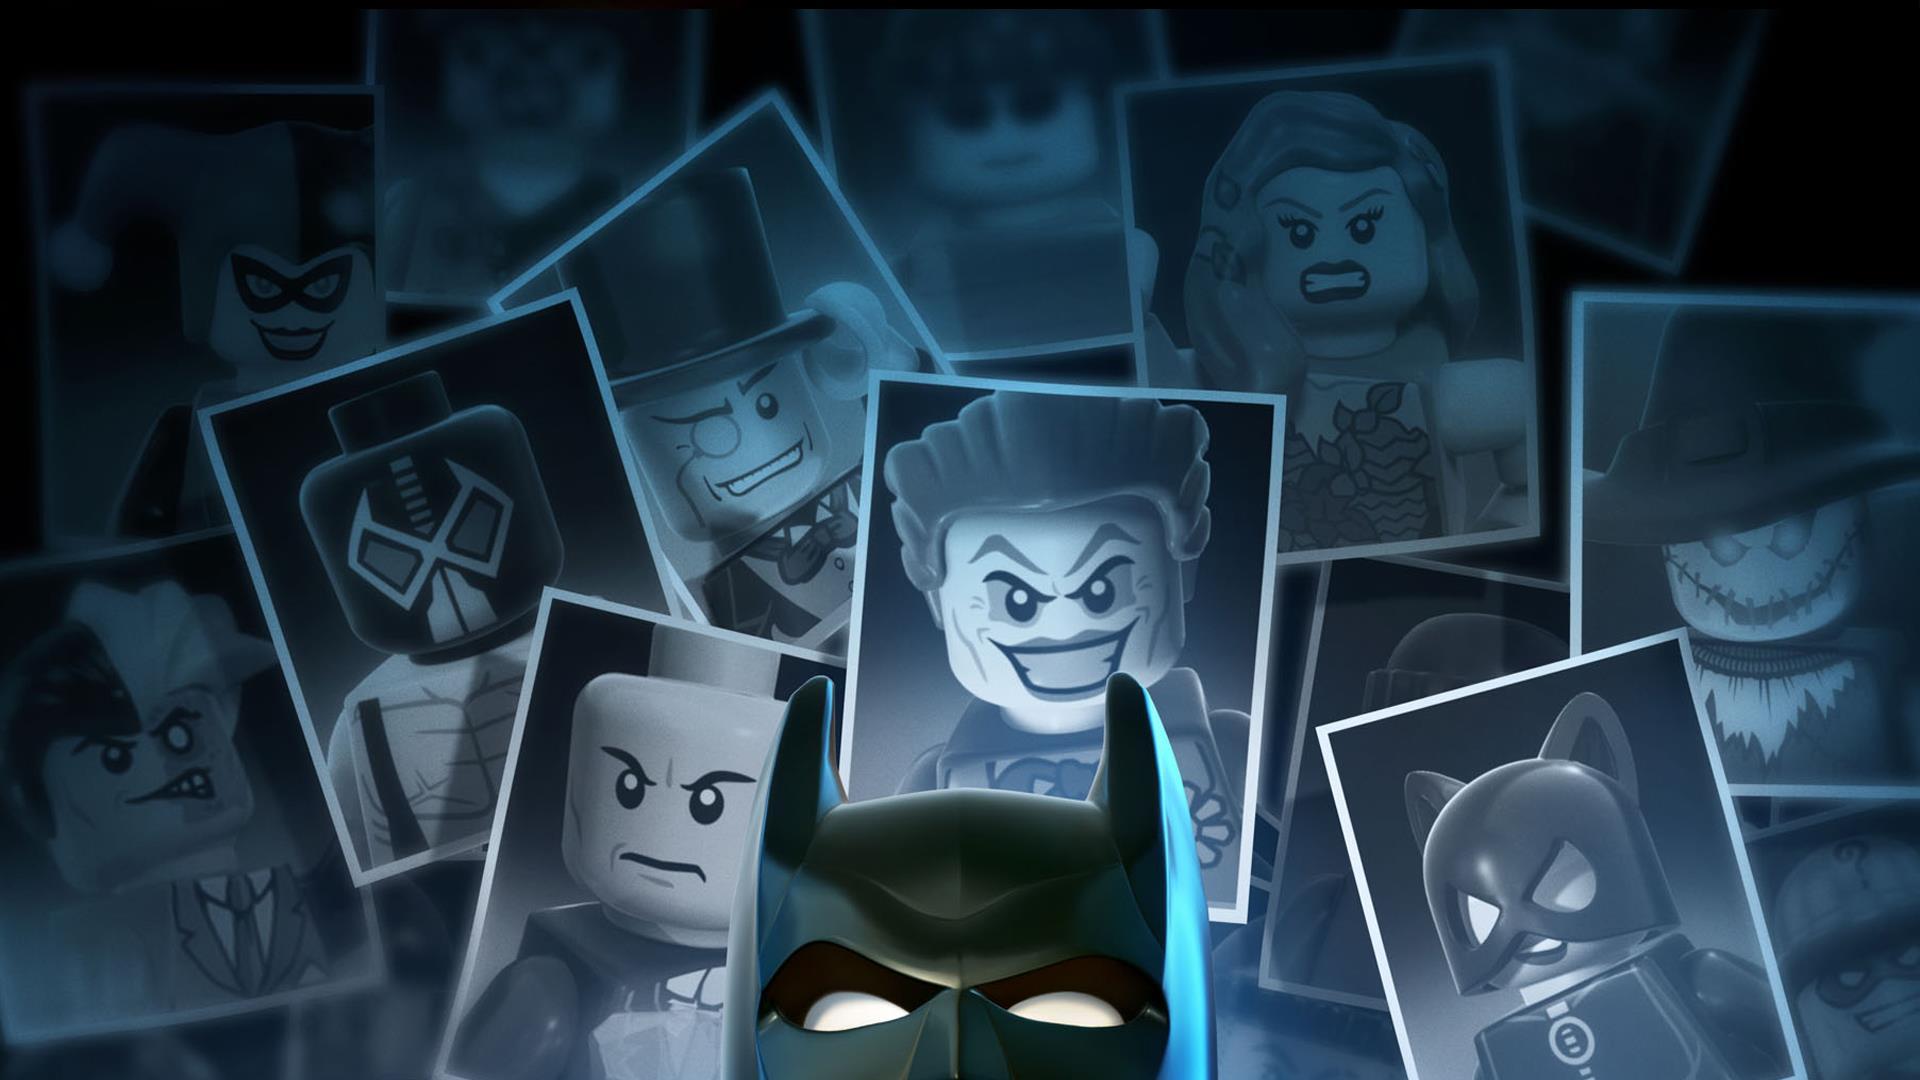 Lego batman computer wallpapers desktop backgrounds 1920x1080 id